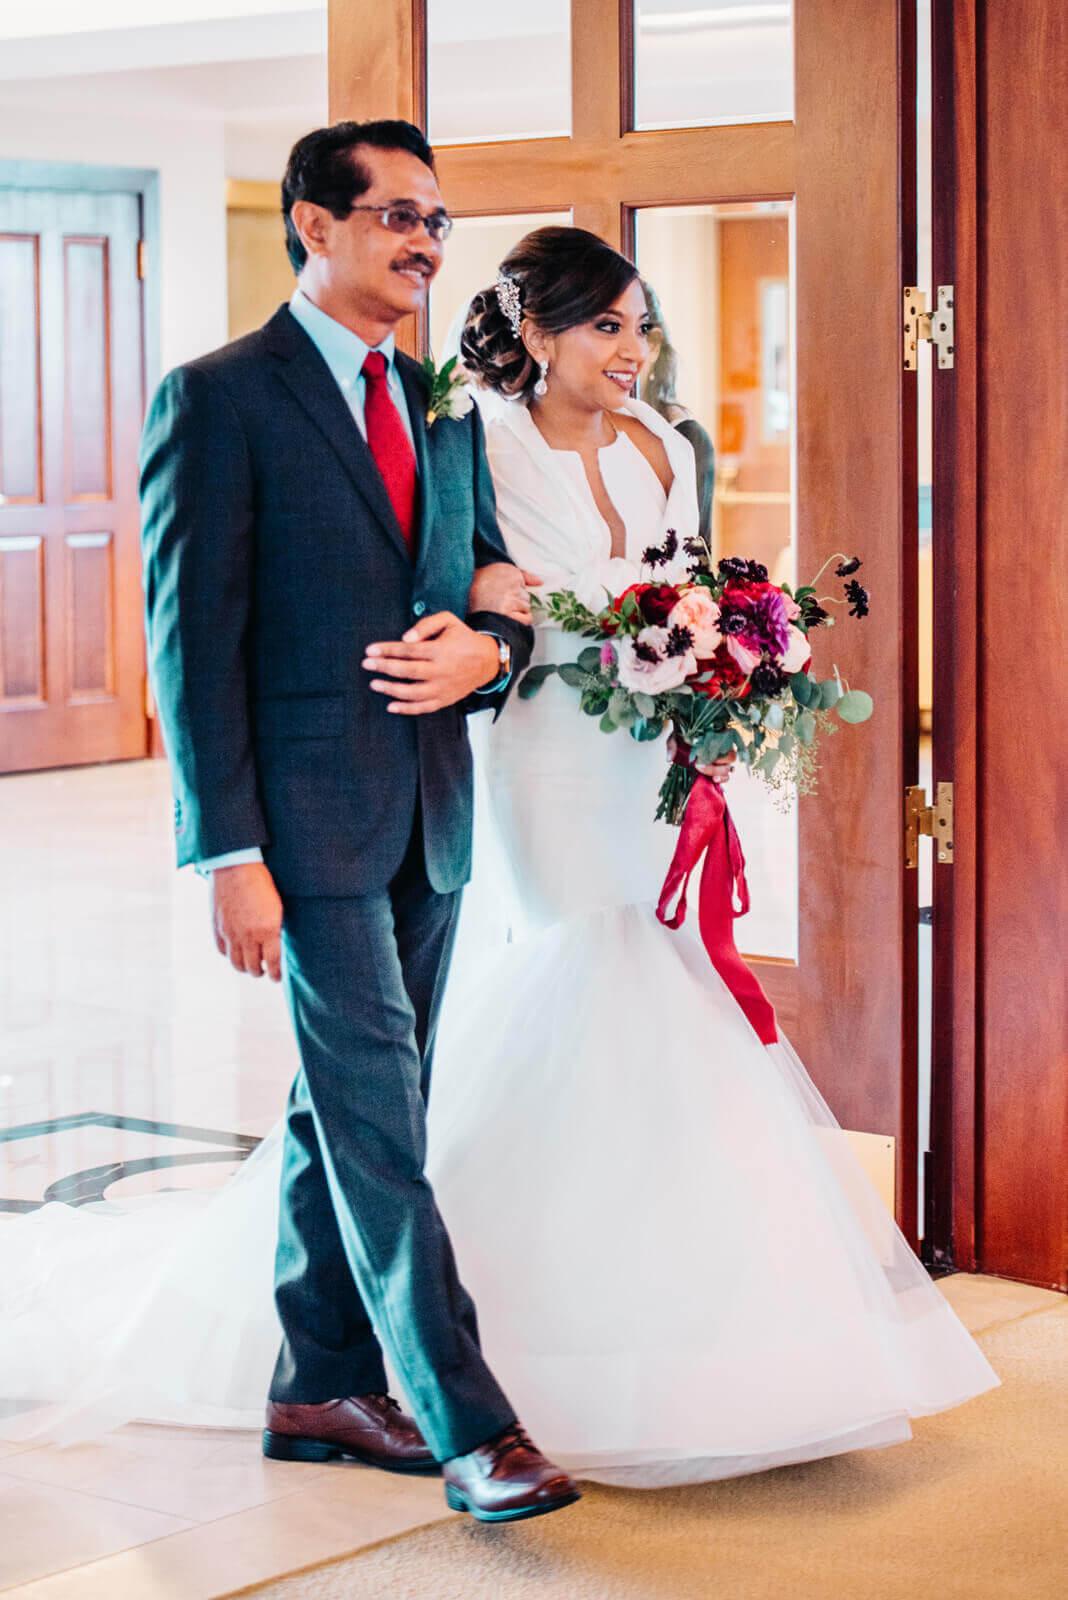 Stone Tower Winery wedding (37).jpg